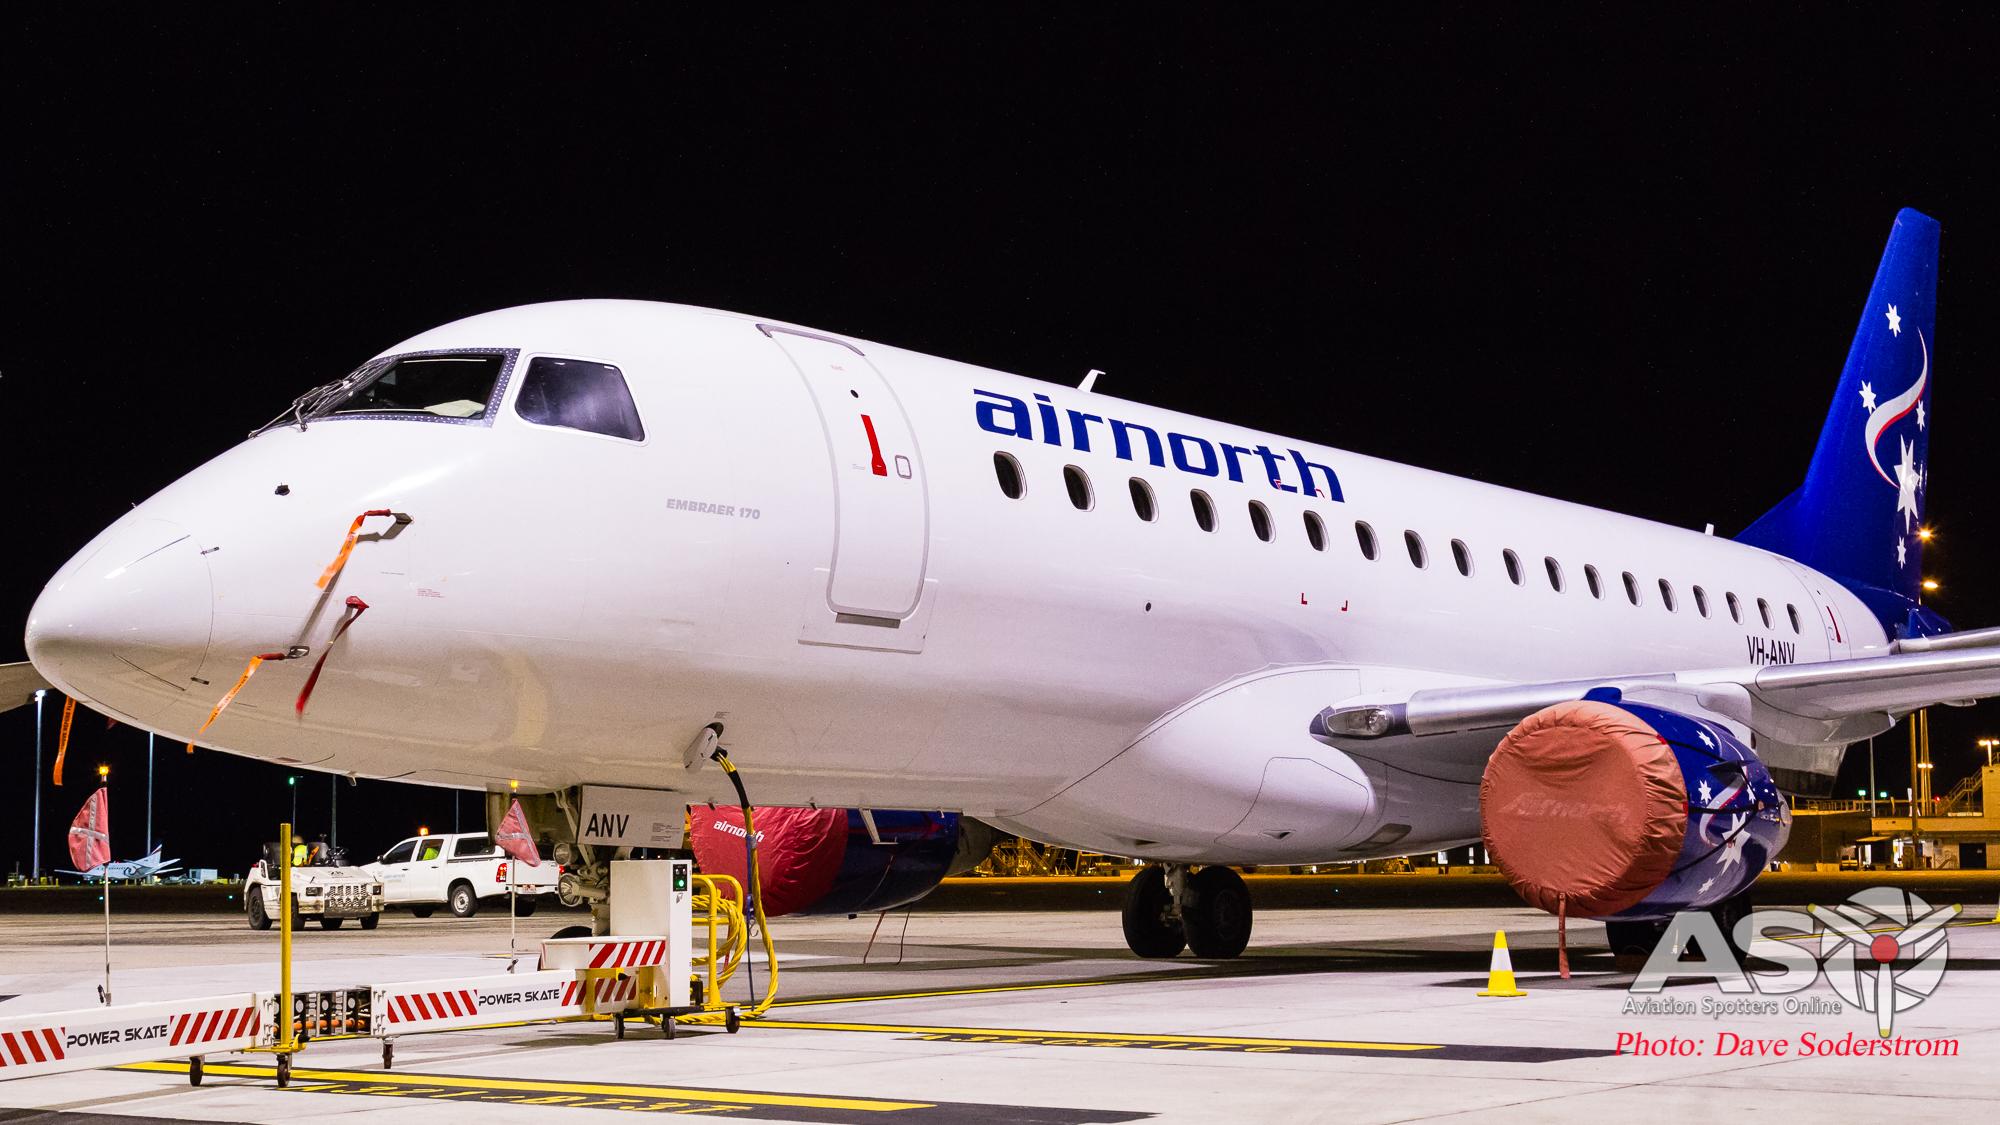 Airnorth celebrate their 40th anniversary in aviation.